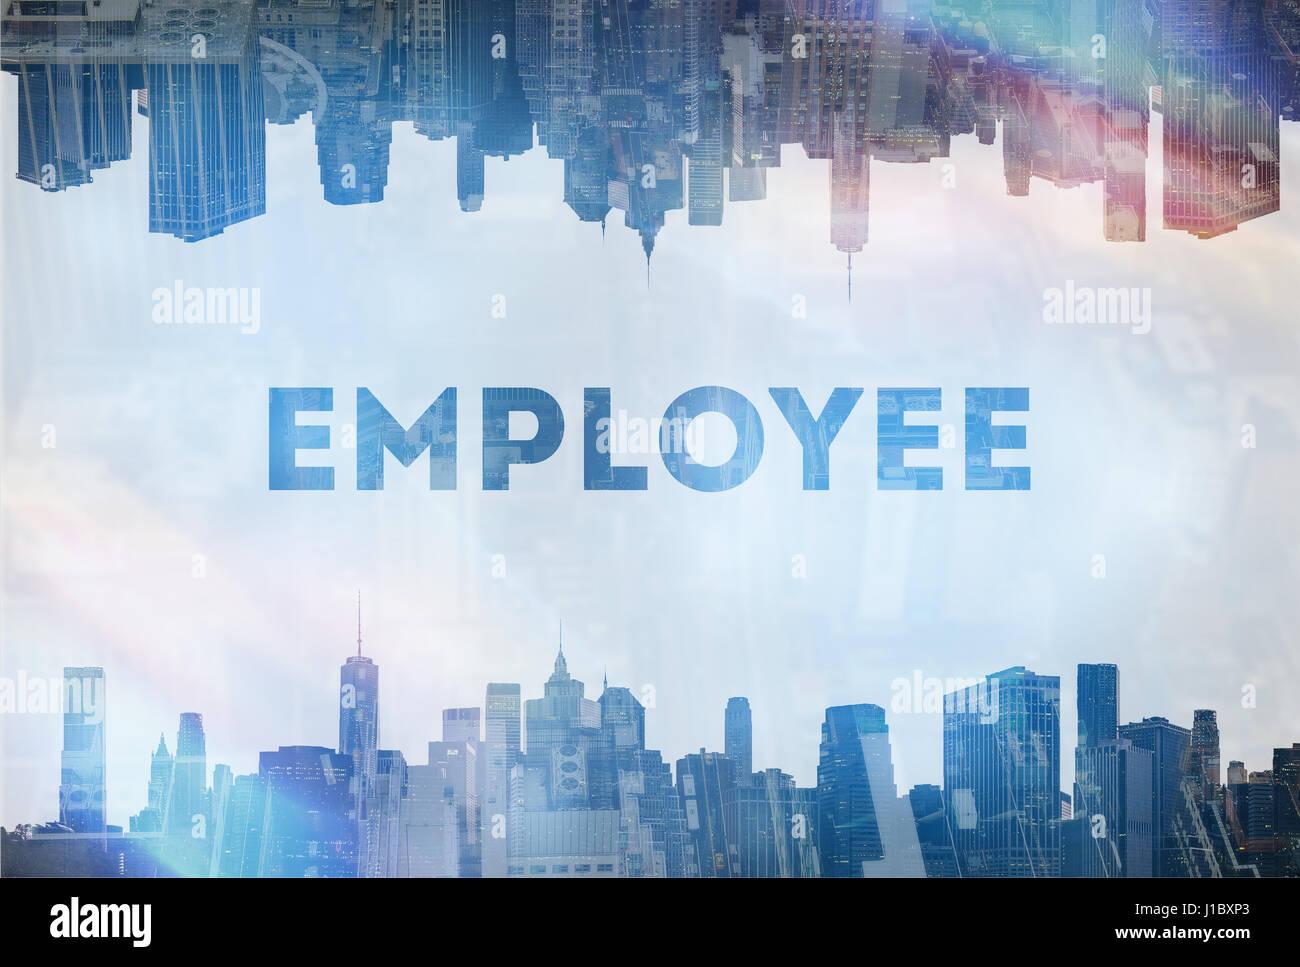 Employee motivation concept image - Stock Image